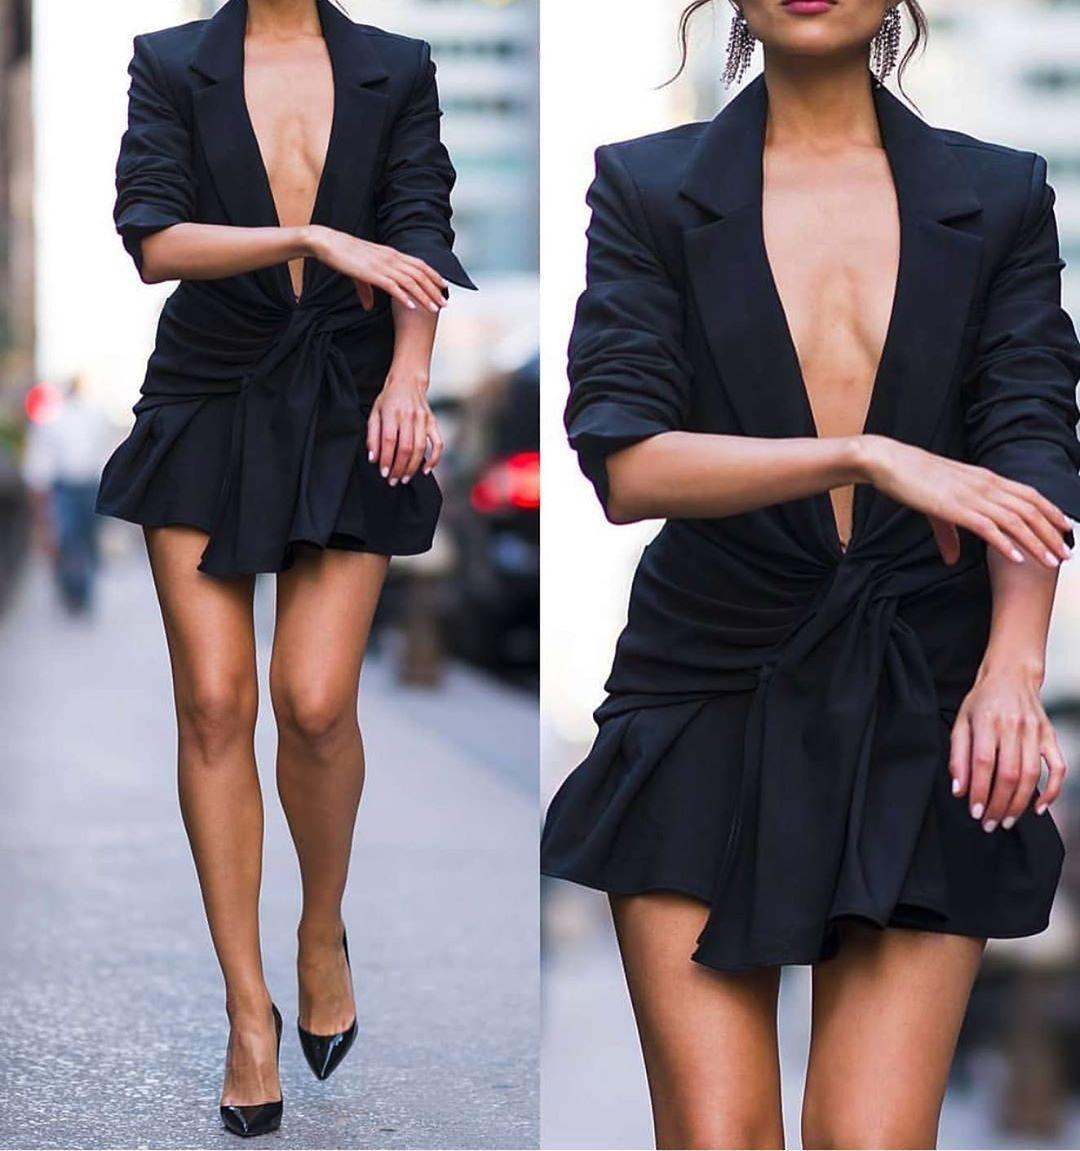 #luxury#fashion#fashionstyle#lipstick#sparkle#losangeles#ny#dubai#miami#greece#style#luxurylife#luxu...